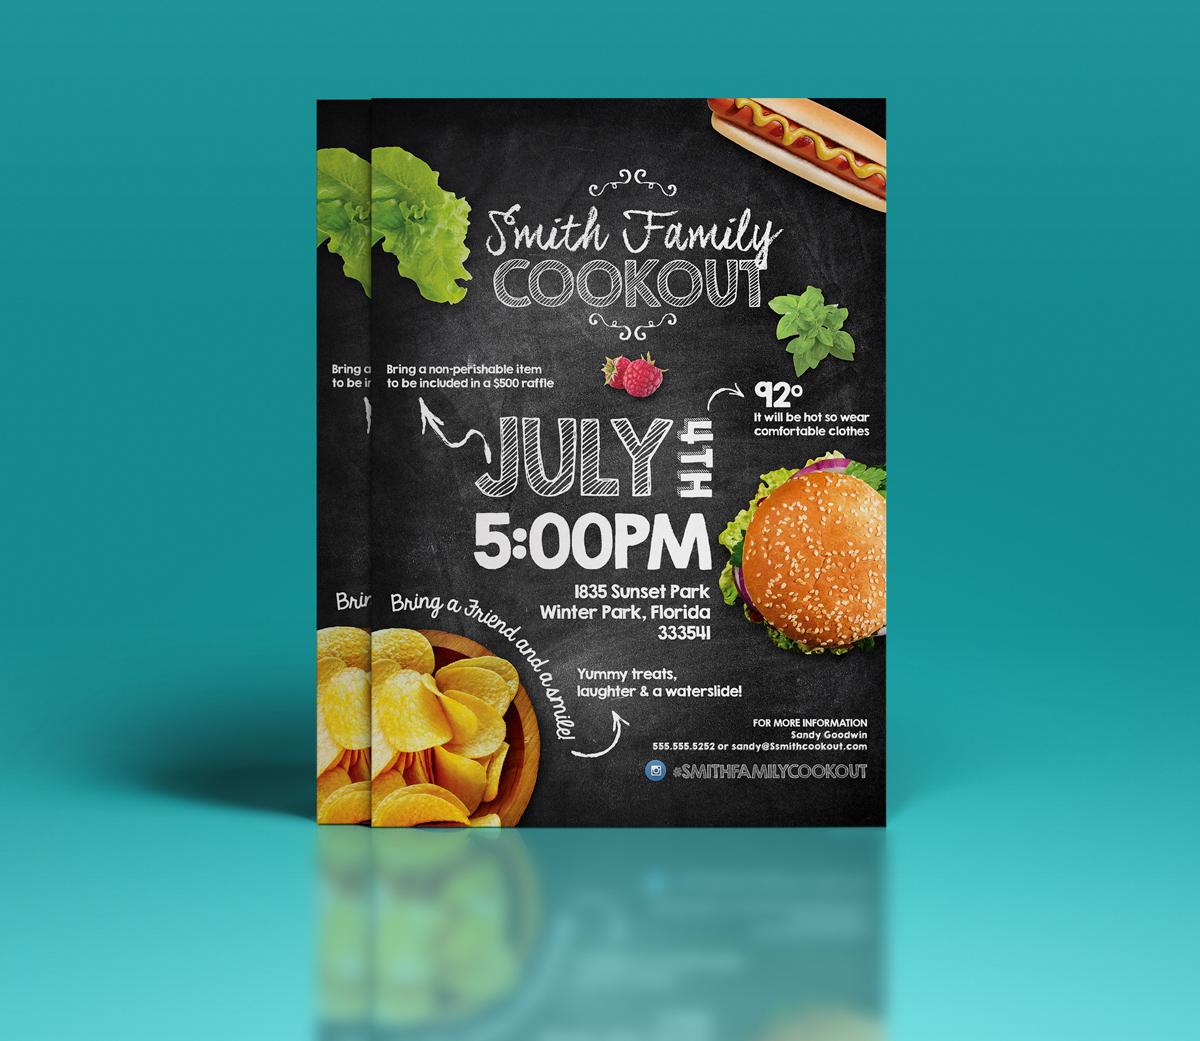 Summer Cookout Party Flyer   Flyer Templates on Creative Market JJee87cw